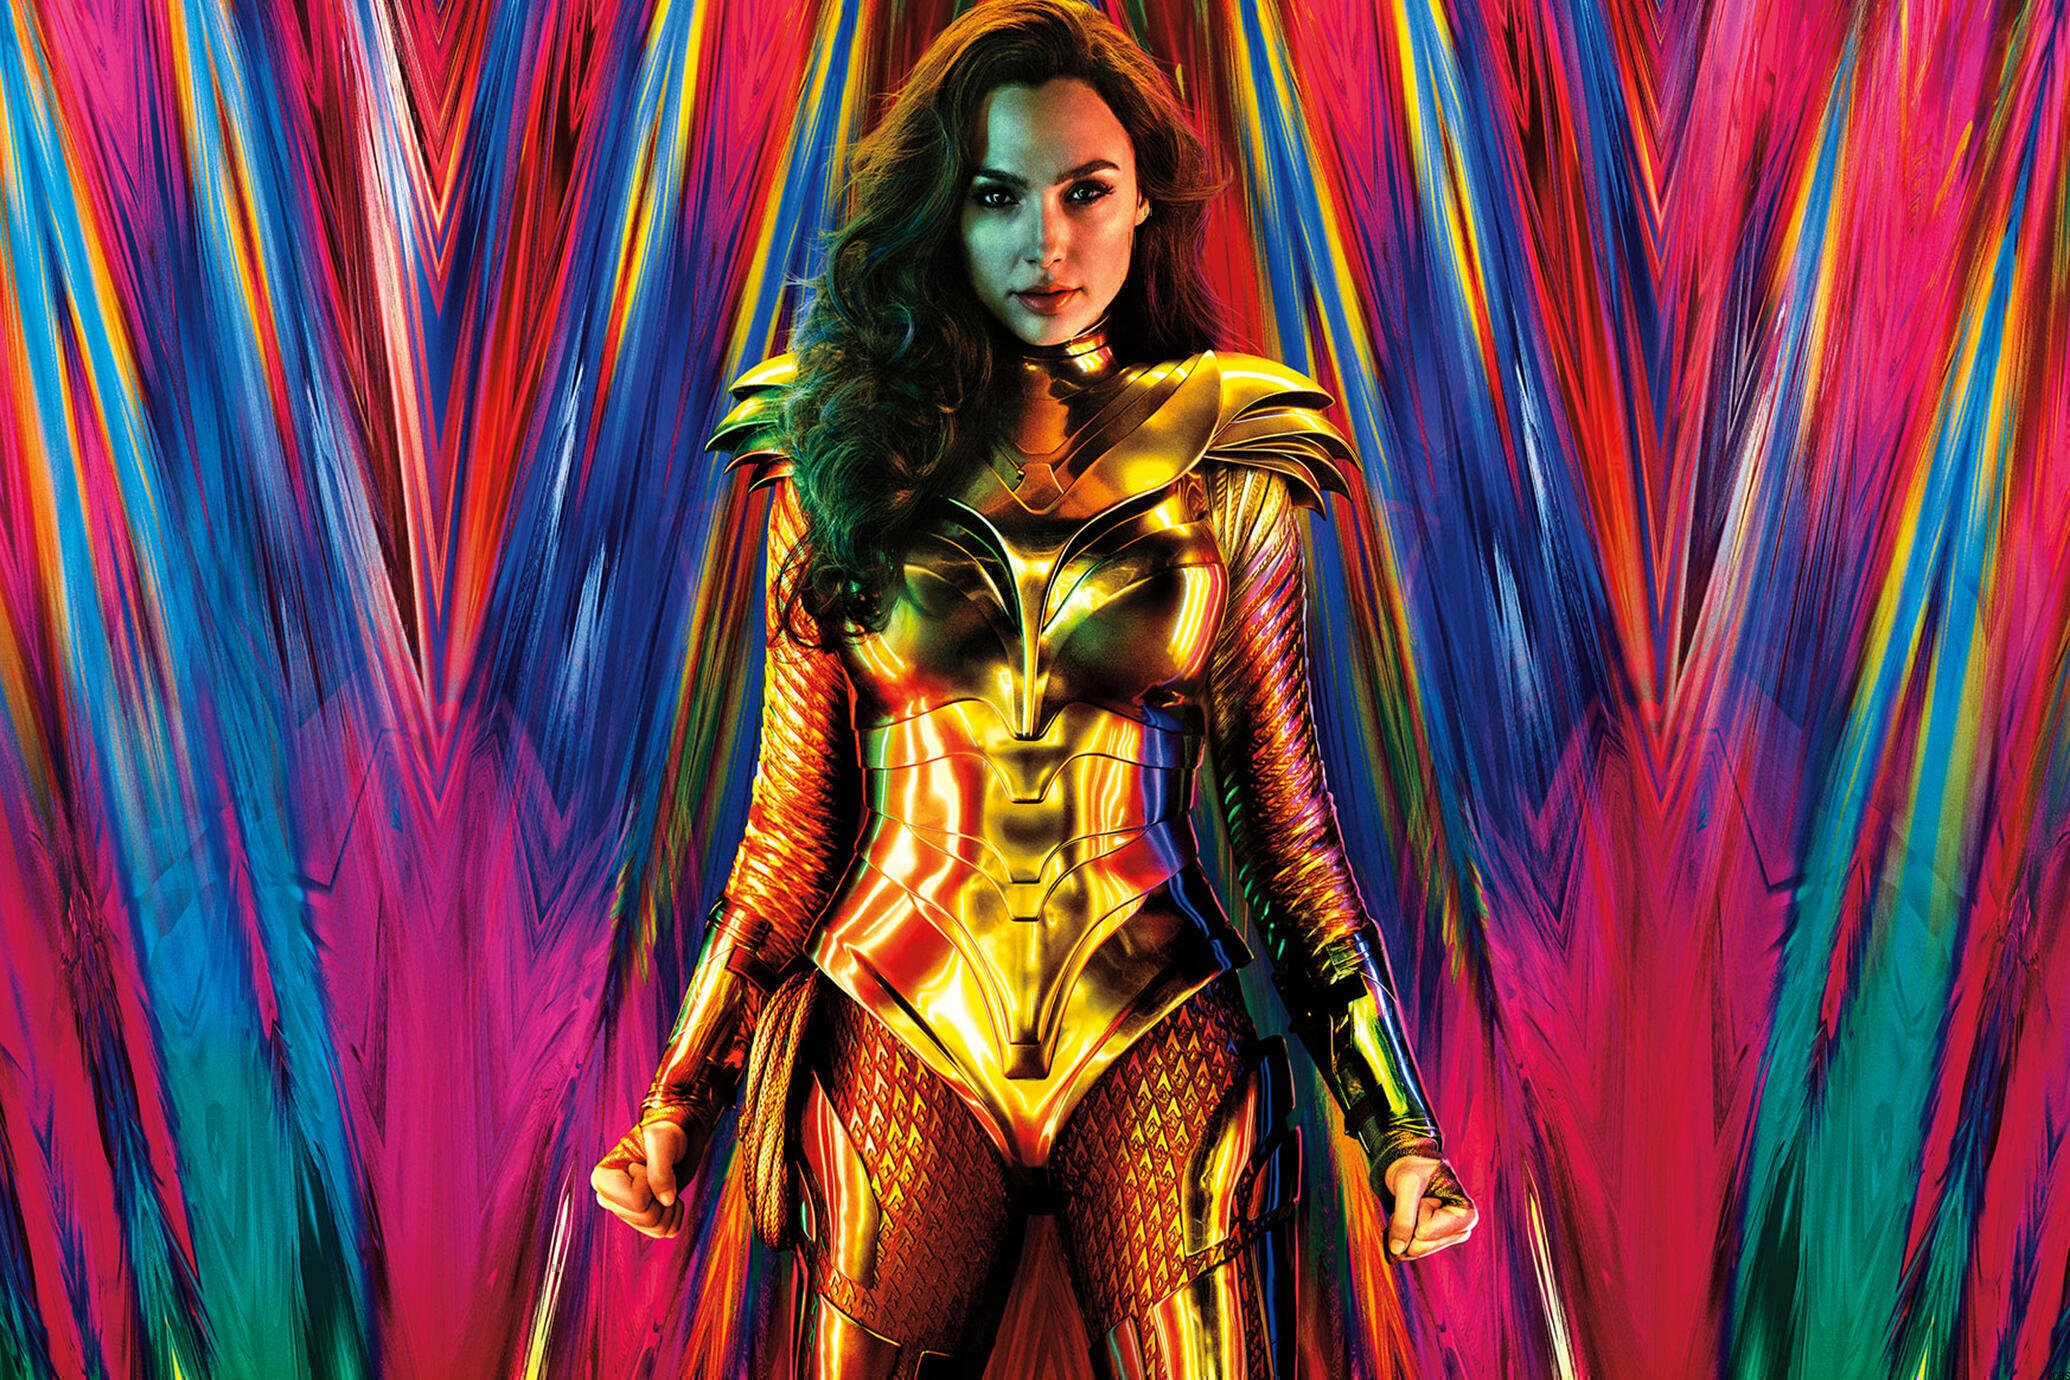 Wonder Woman 1984 IMDb Rating